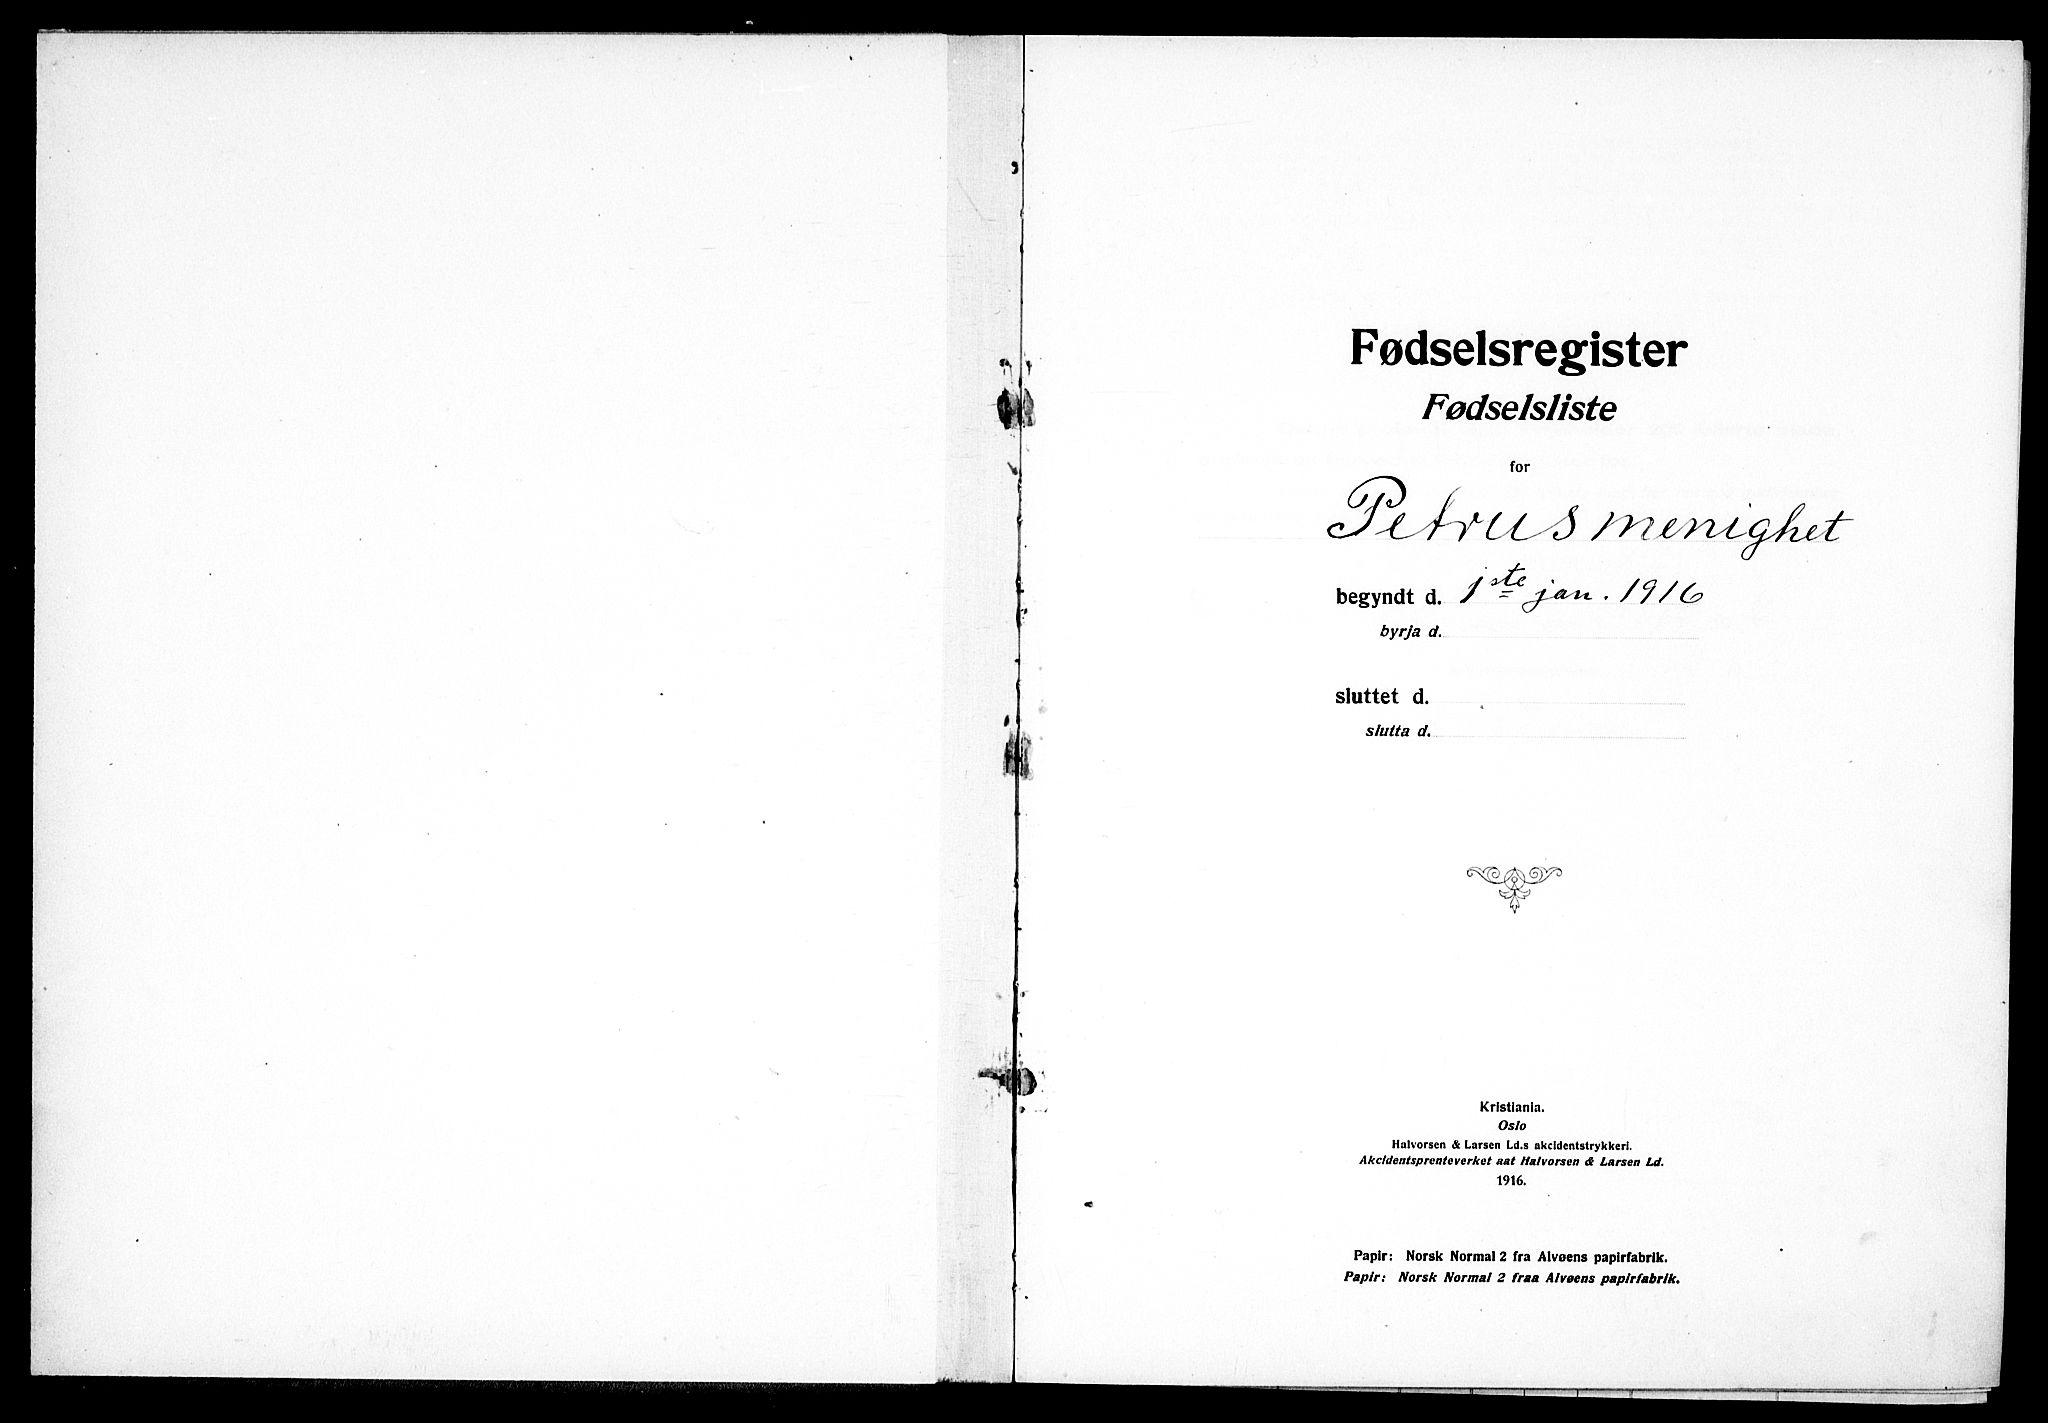 SAO, Petrus prestekontor Kirkebøker, J/Ja/L0001: Fødselsregister nr. 1, 1916-1922